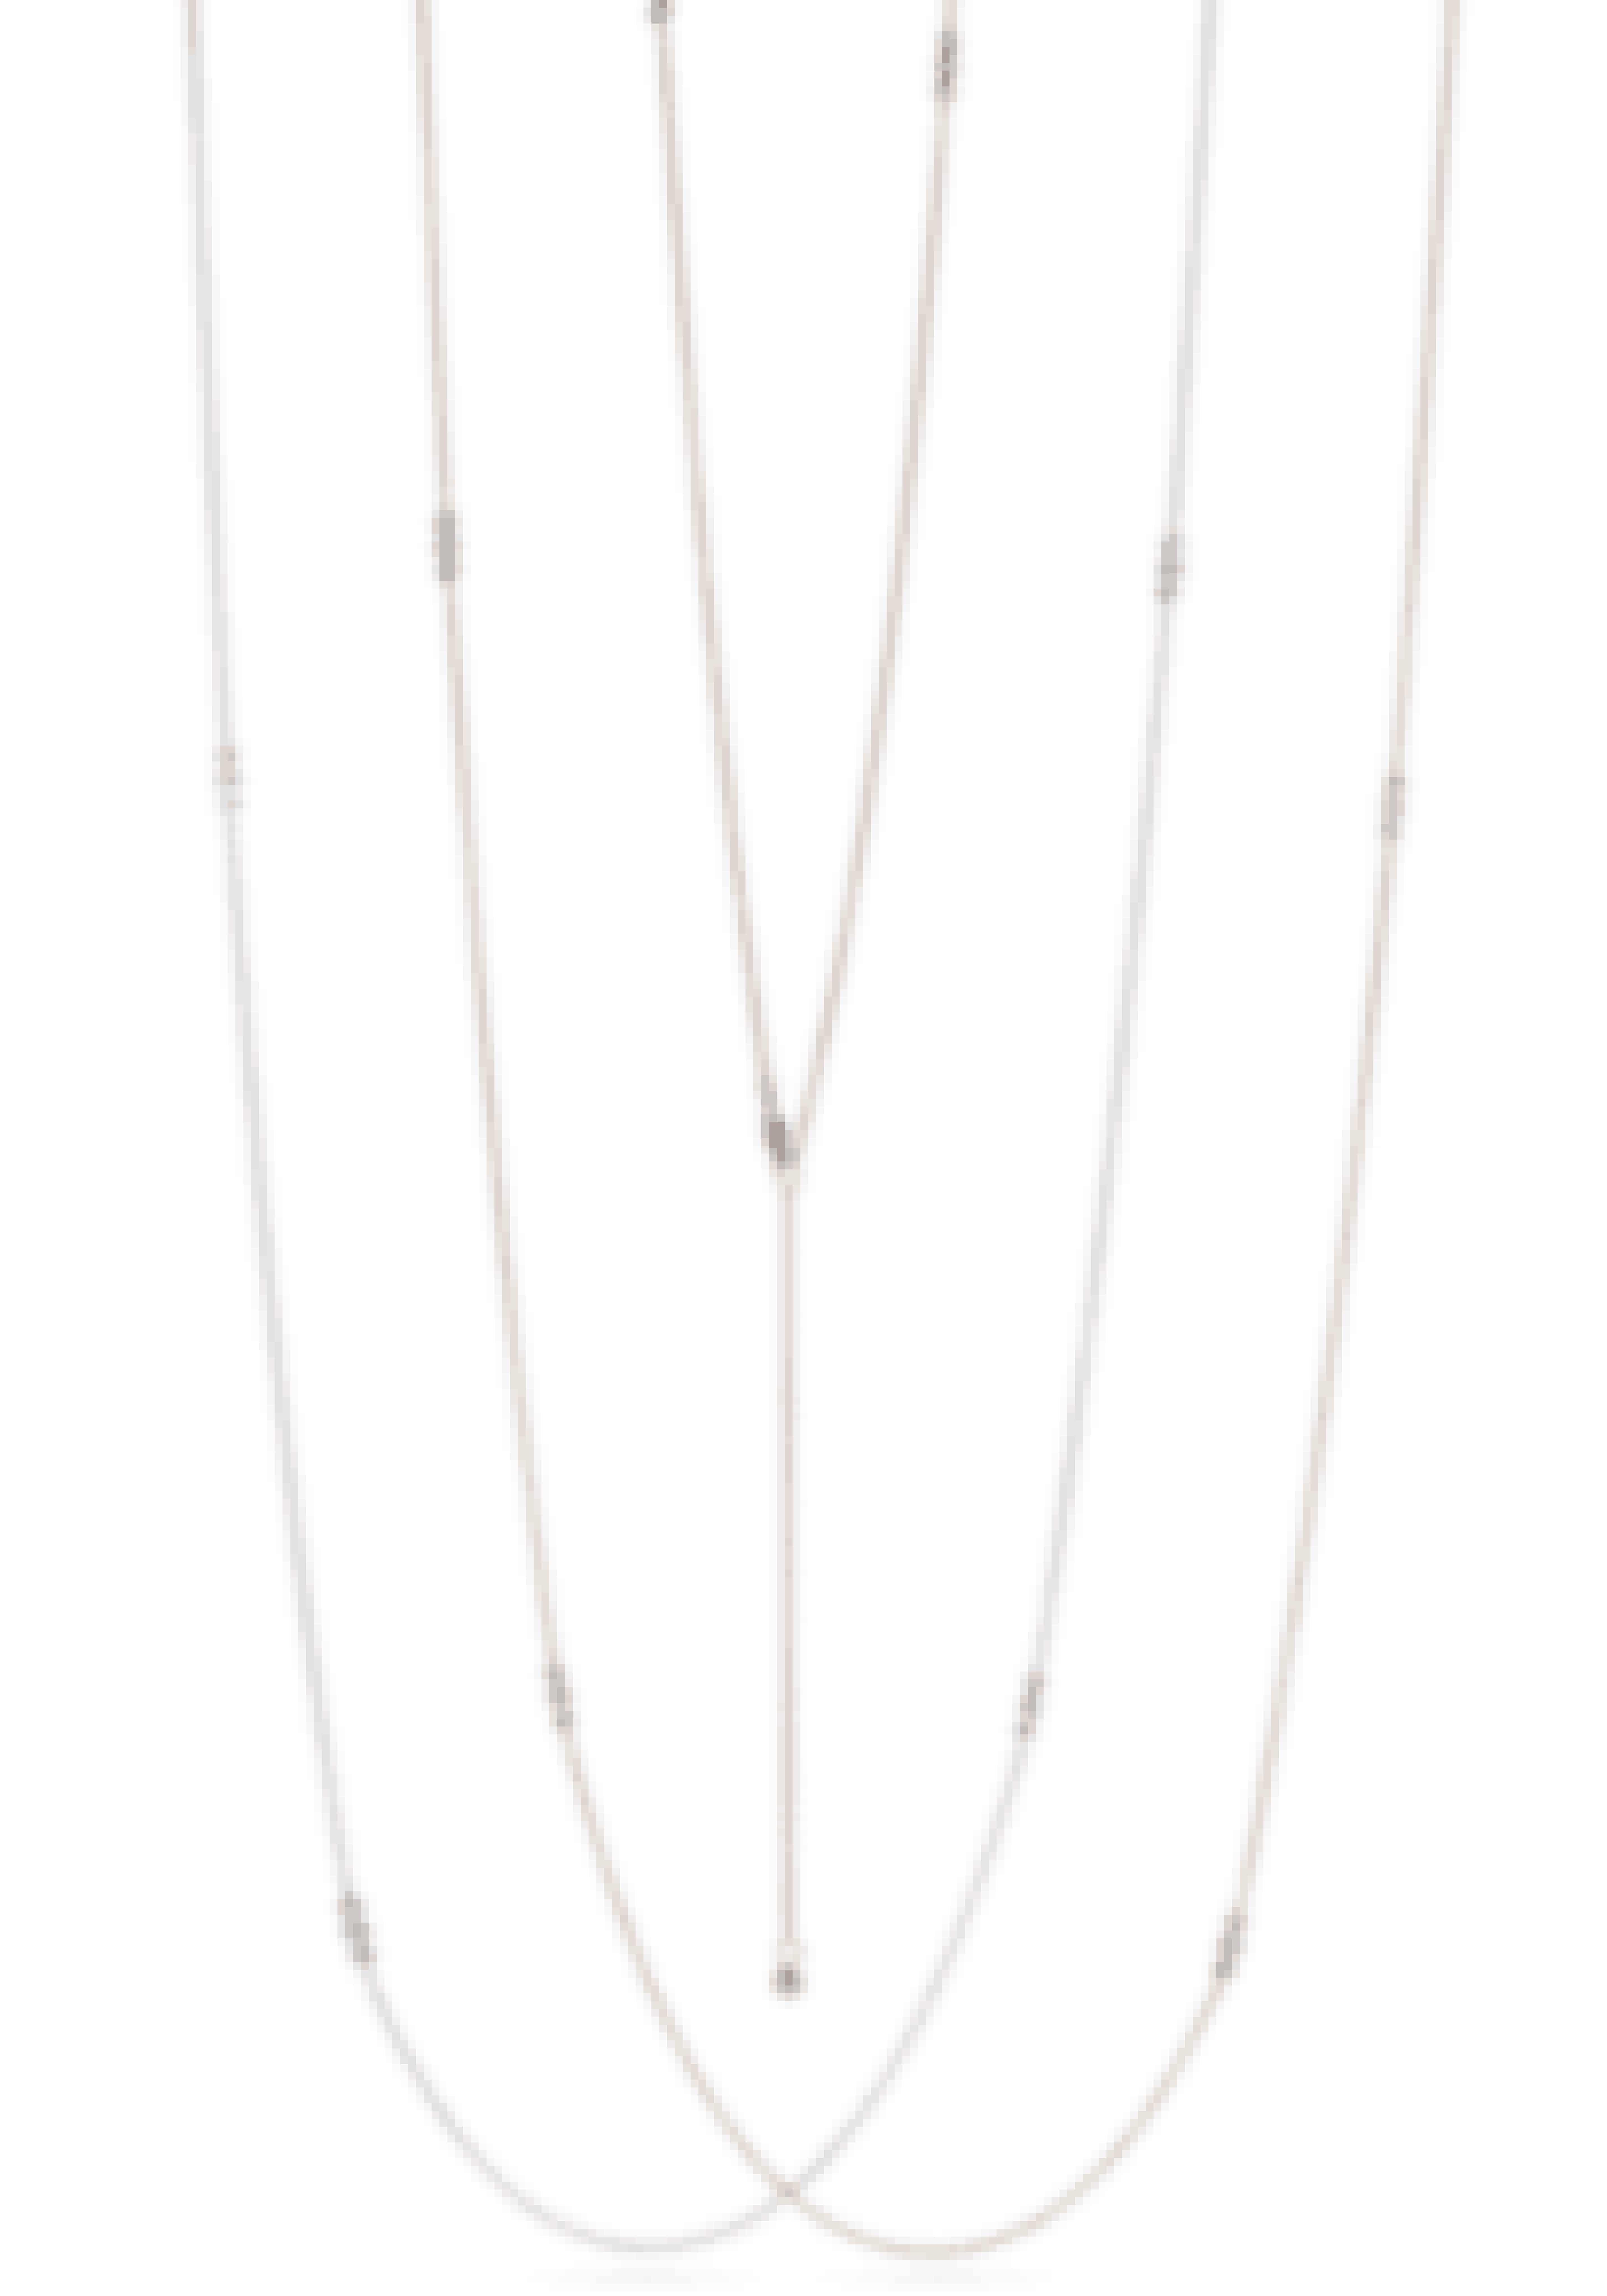 Lang kæde med diamanter, 29.500 kr. Se smykket HER